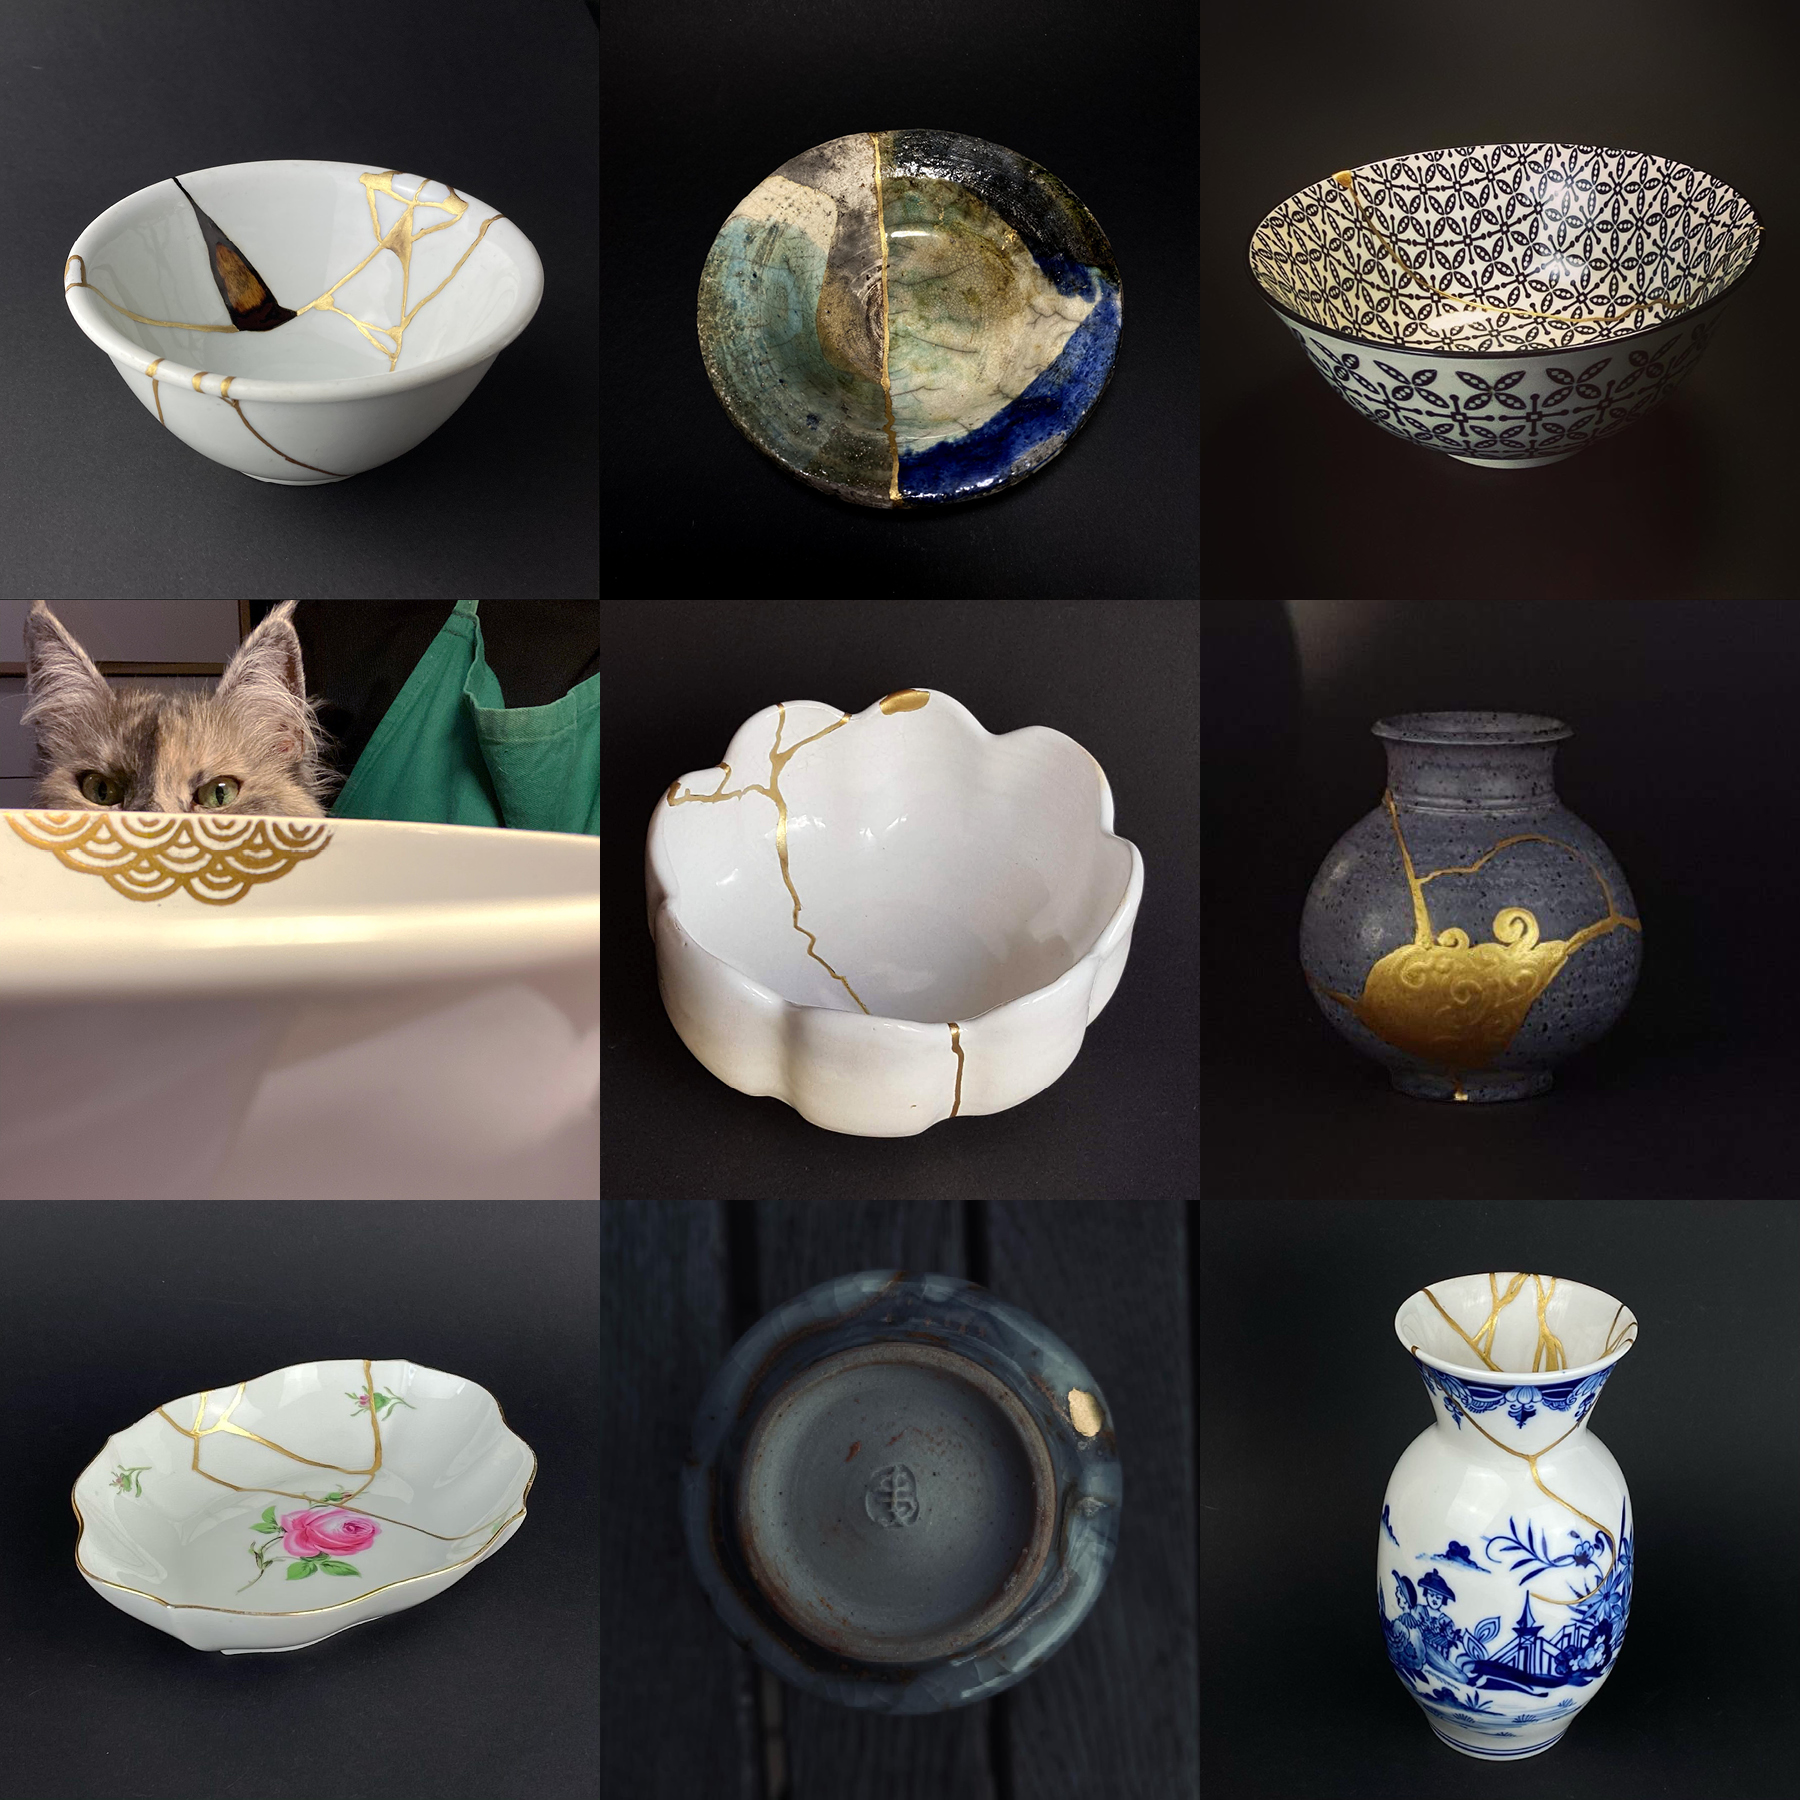 9 Kintsugi Arbeiten Beispiele Atelier kintsugi-i-see